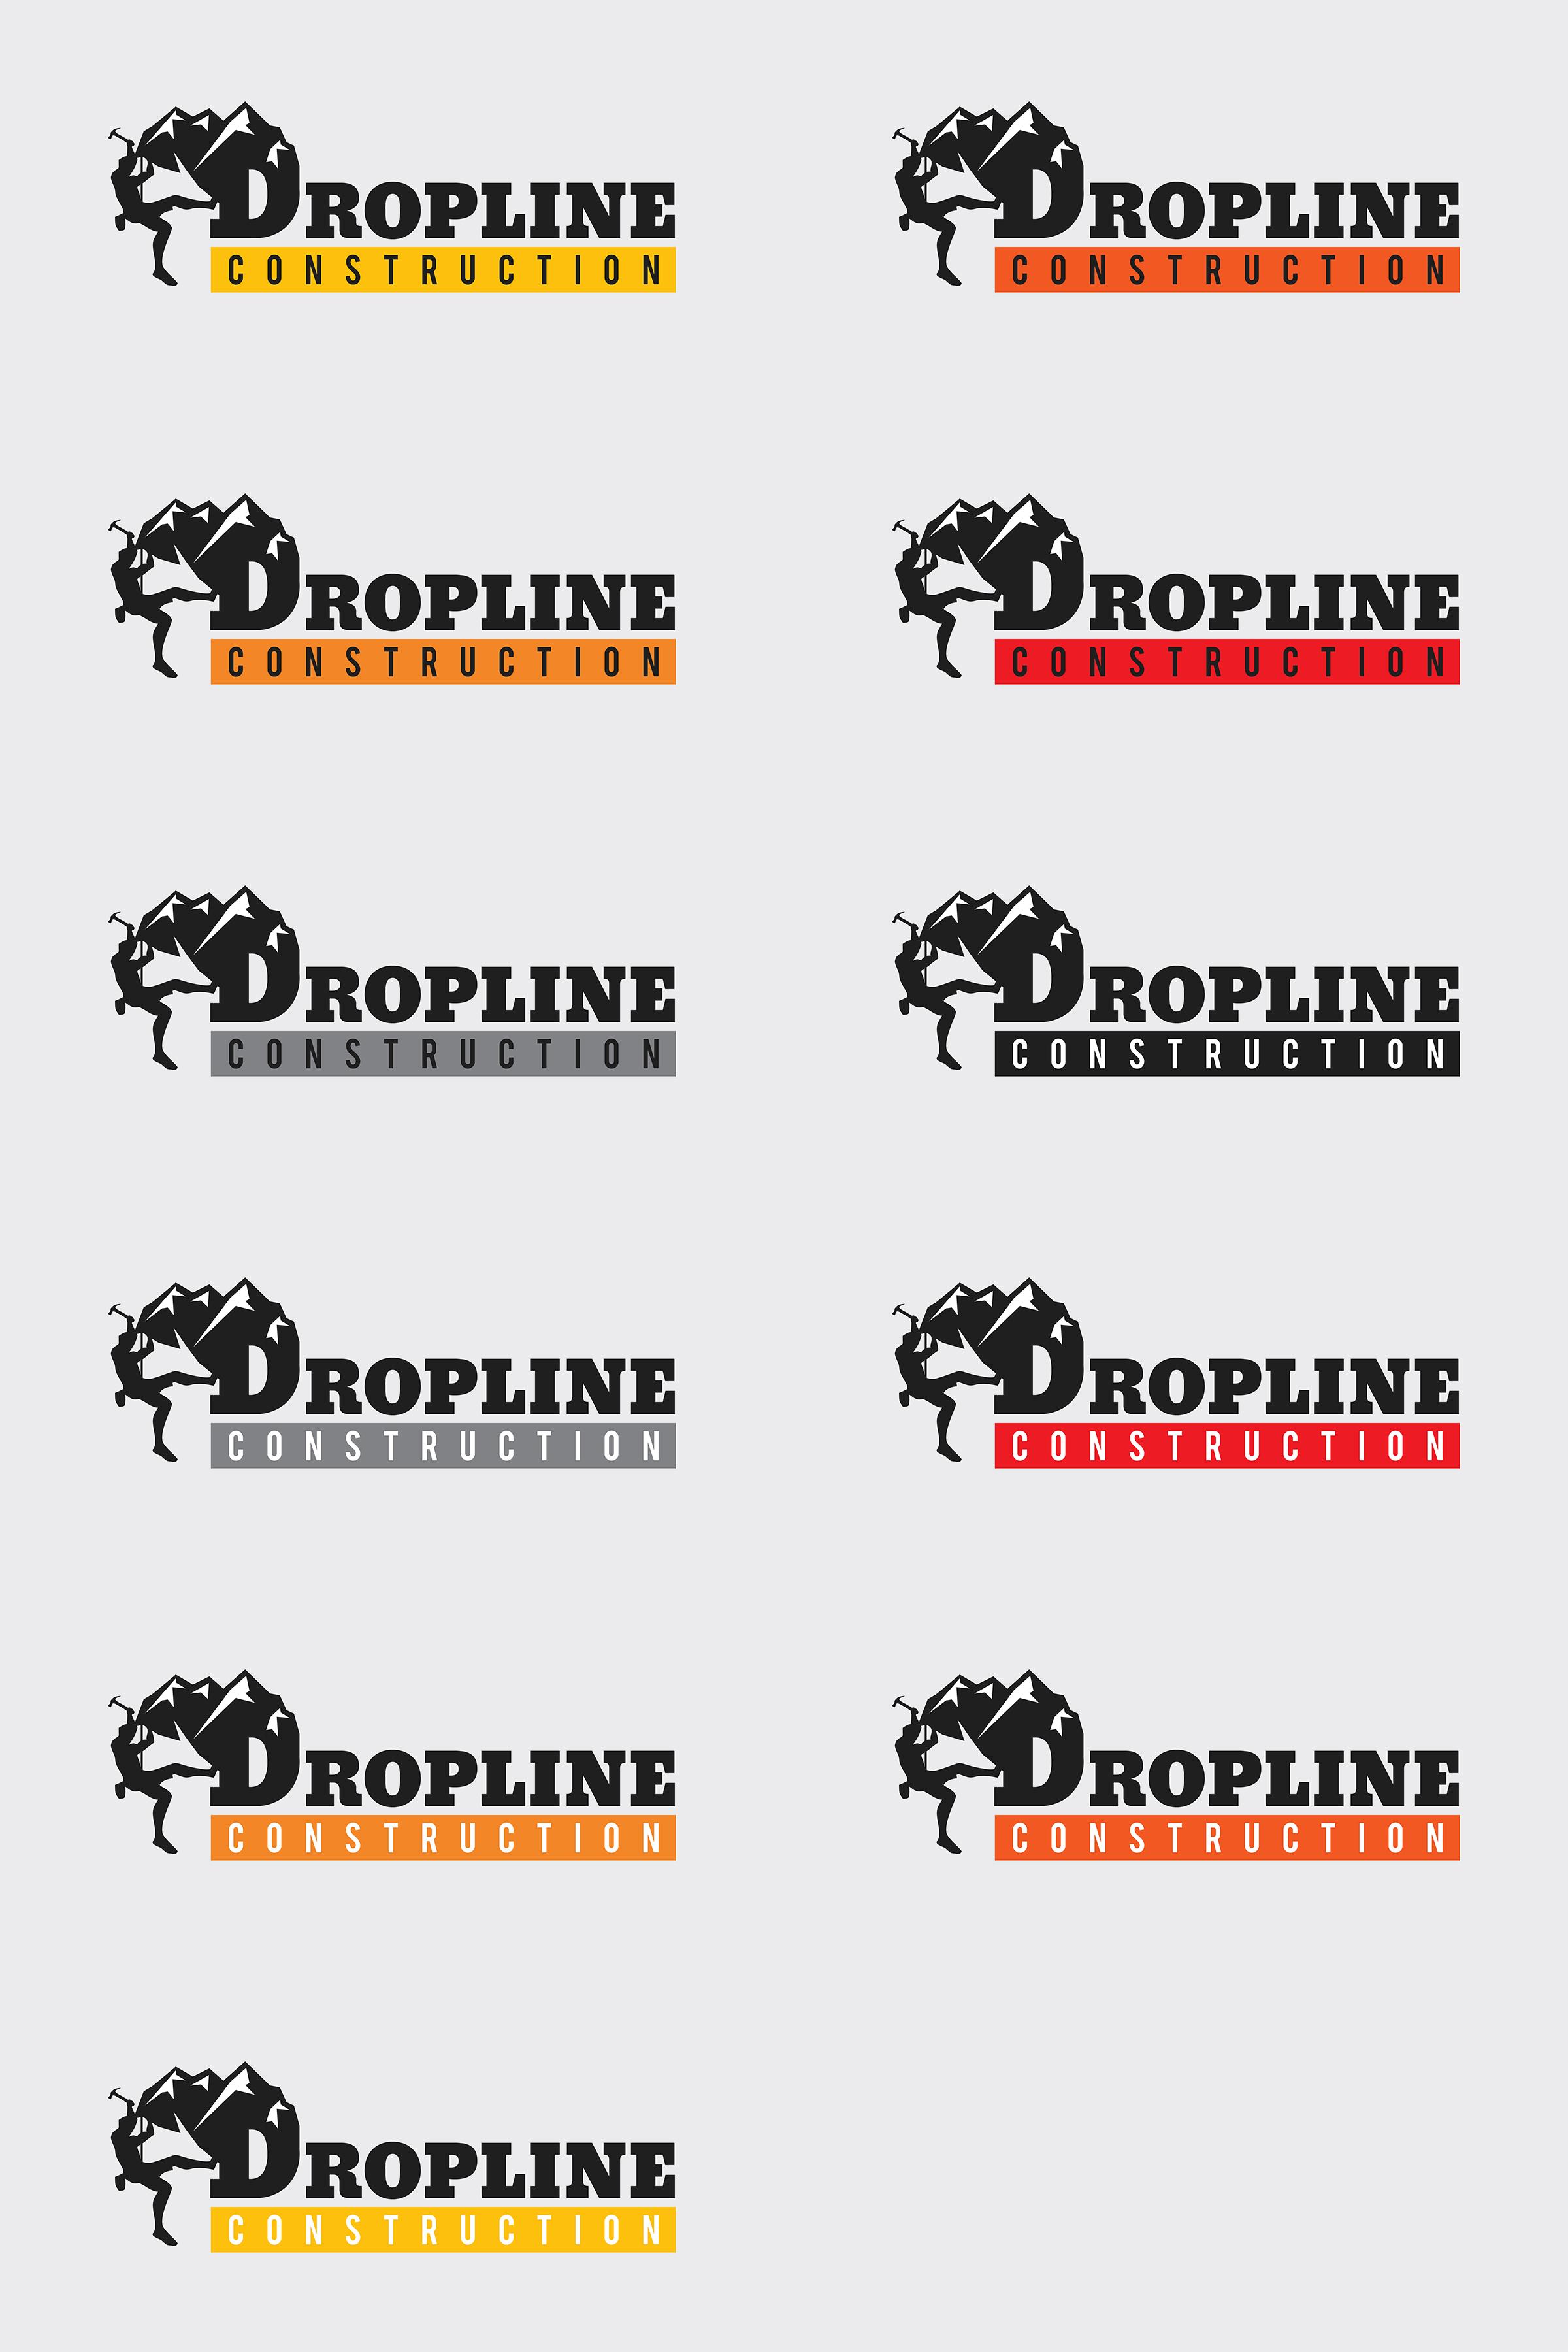 DroplineConstructionColors.jpg